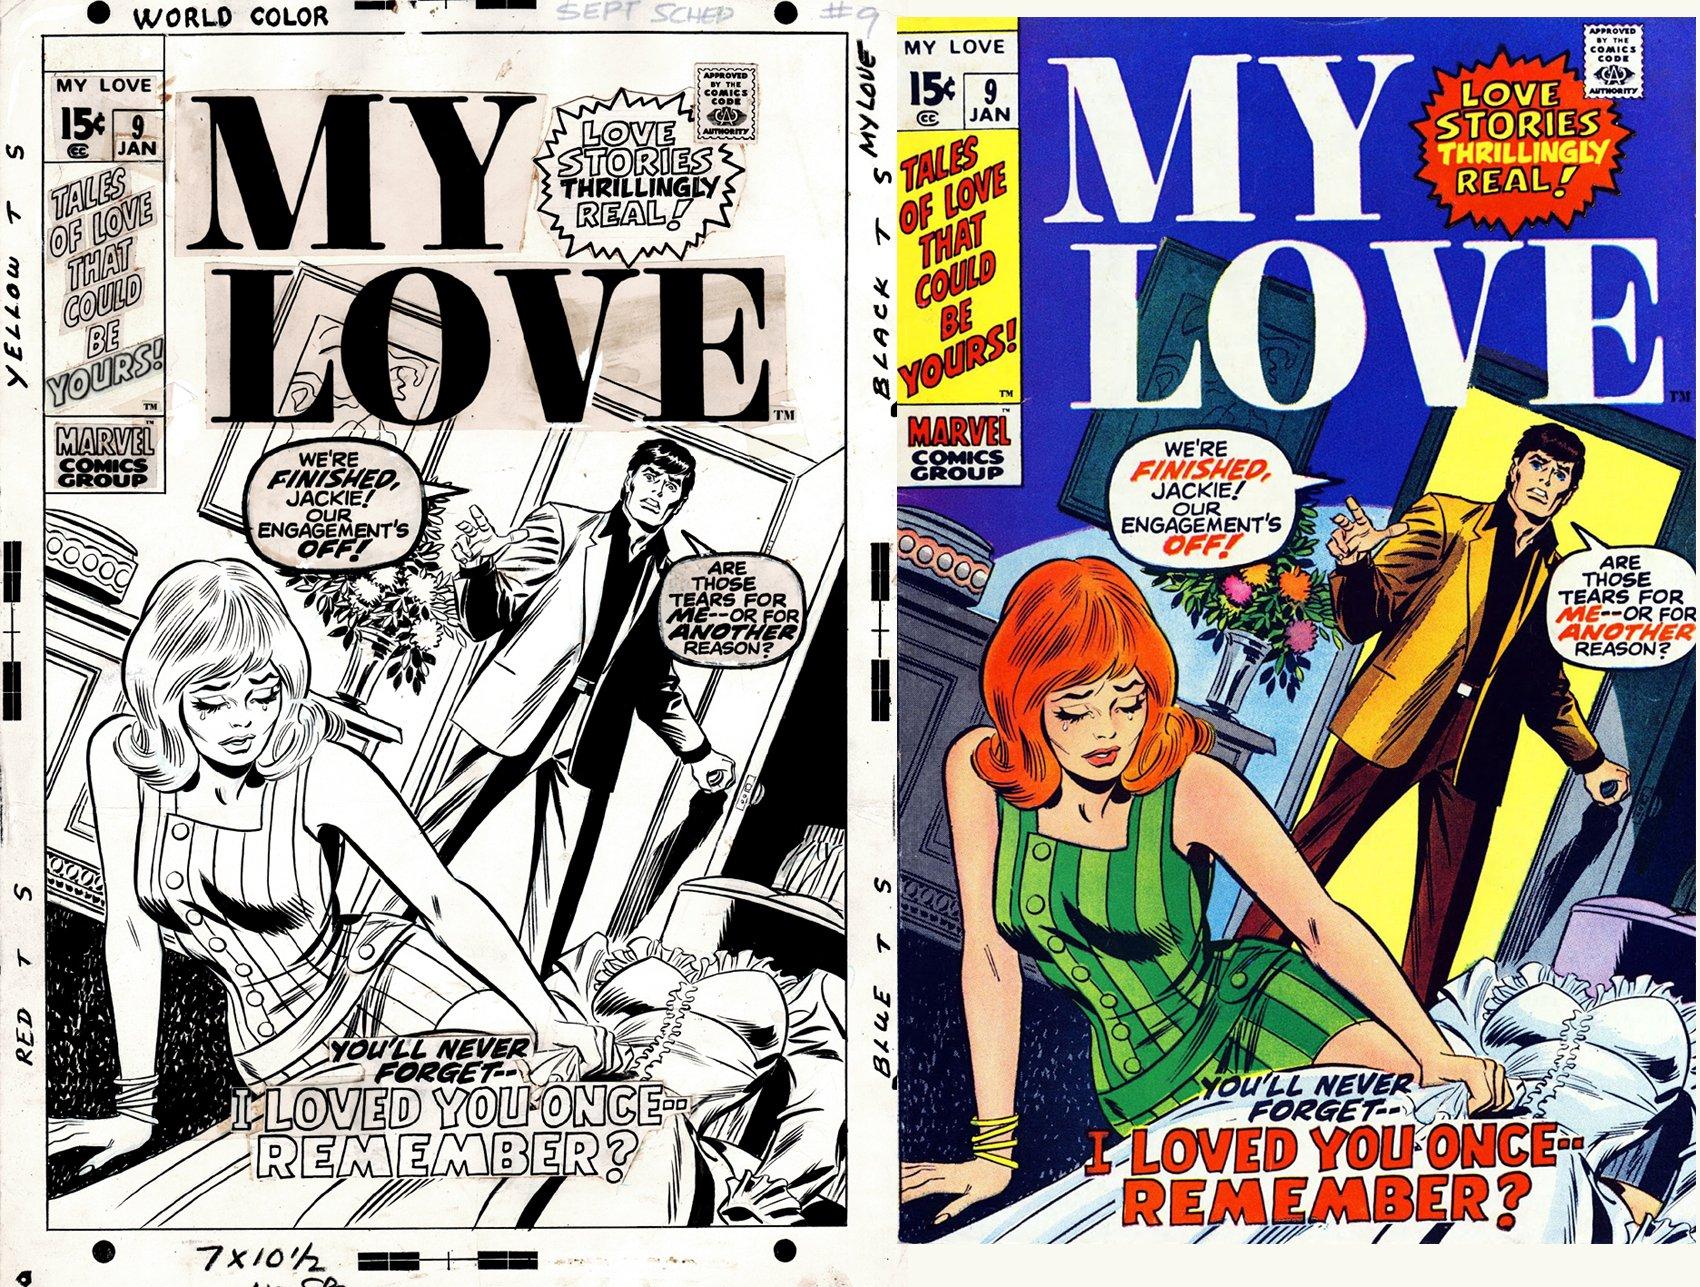 My Love #9 Cover (RARE JOHN BUSCEMA / JOHN ROMITA ART TEAM-UP!) 1970